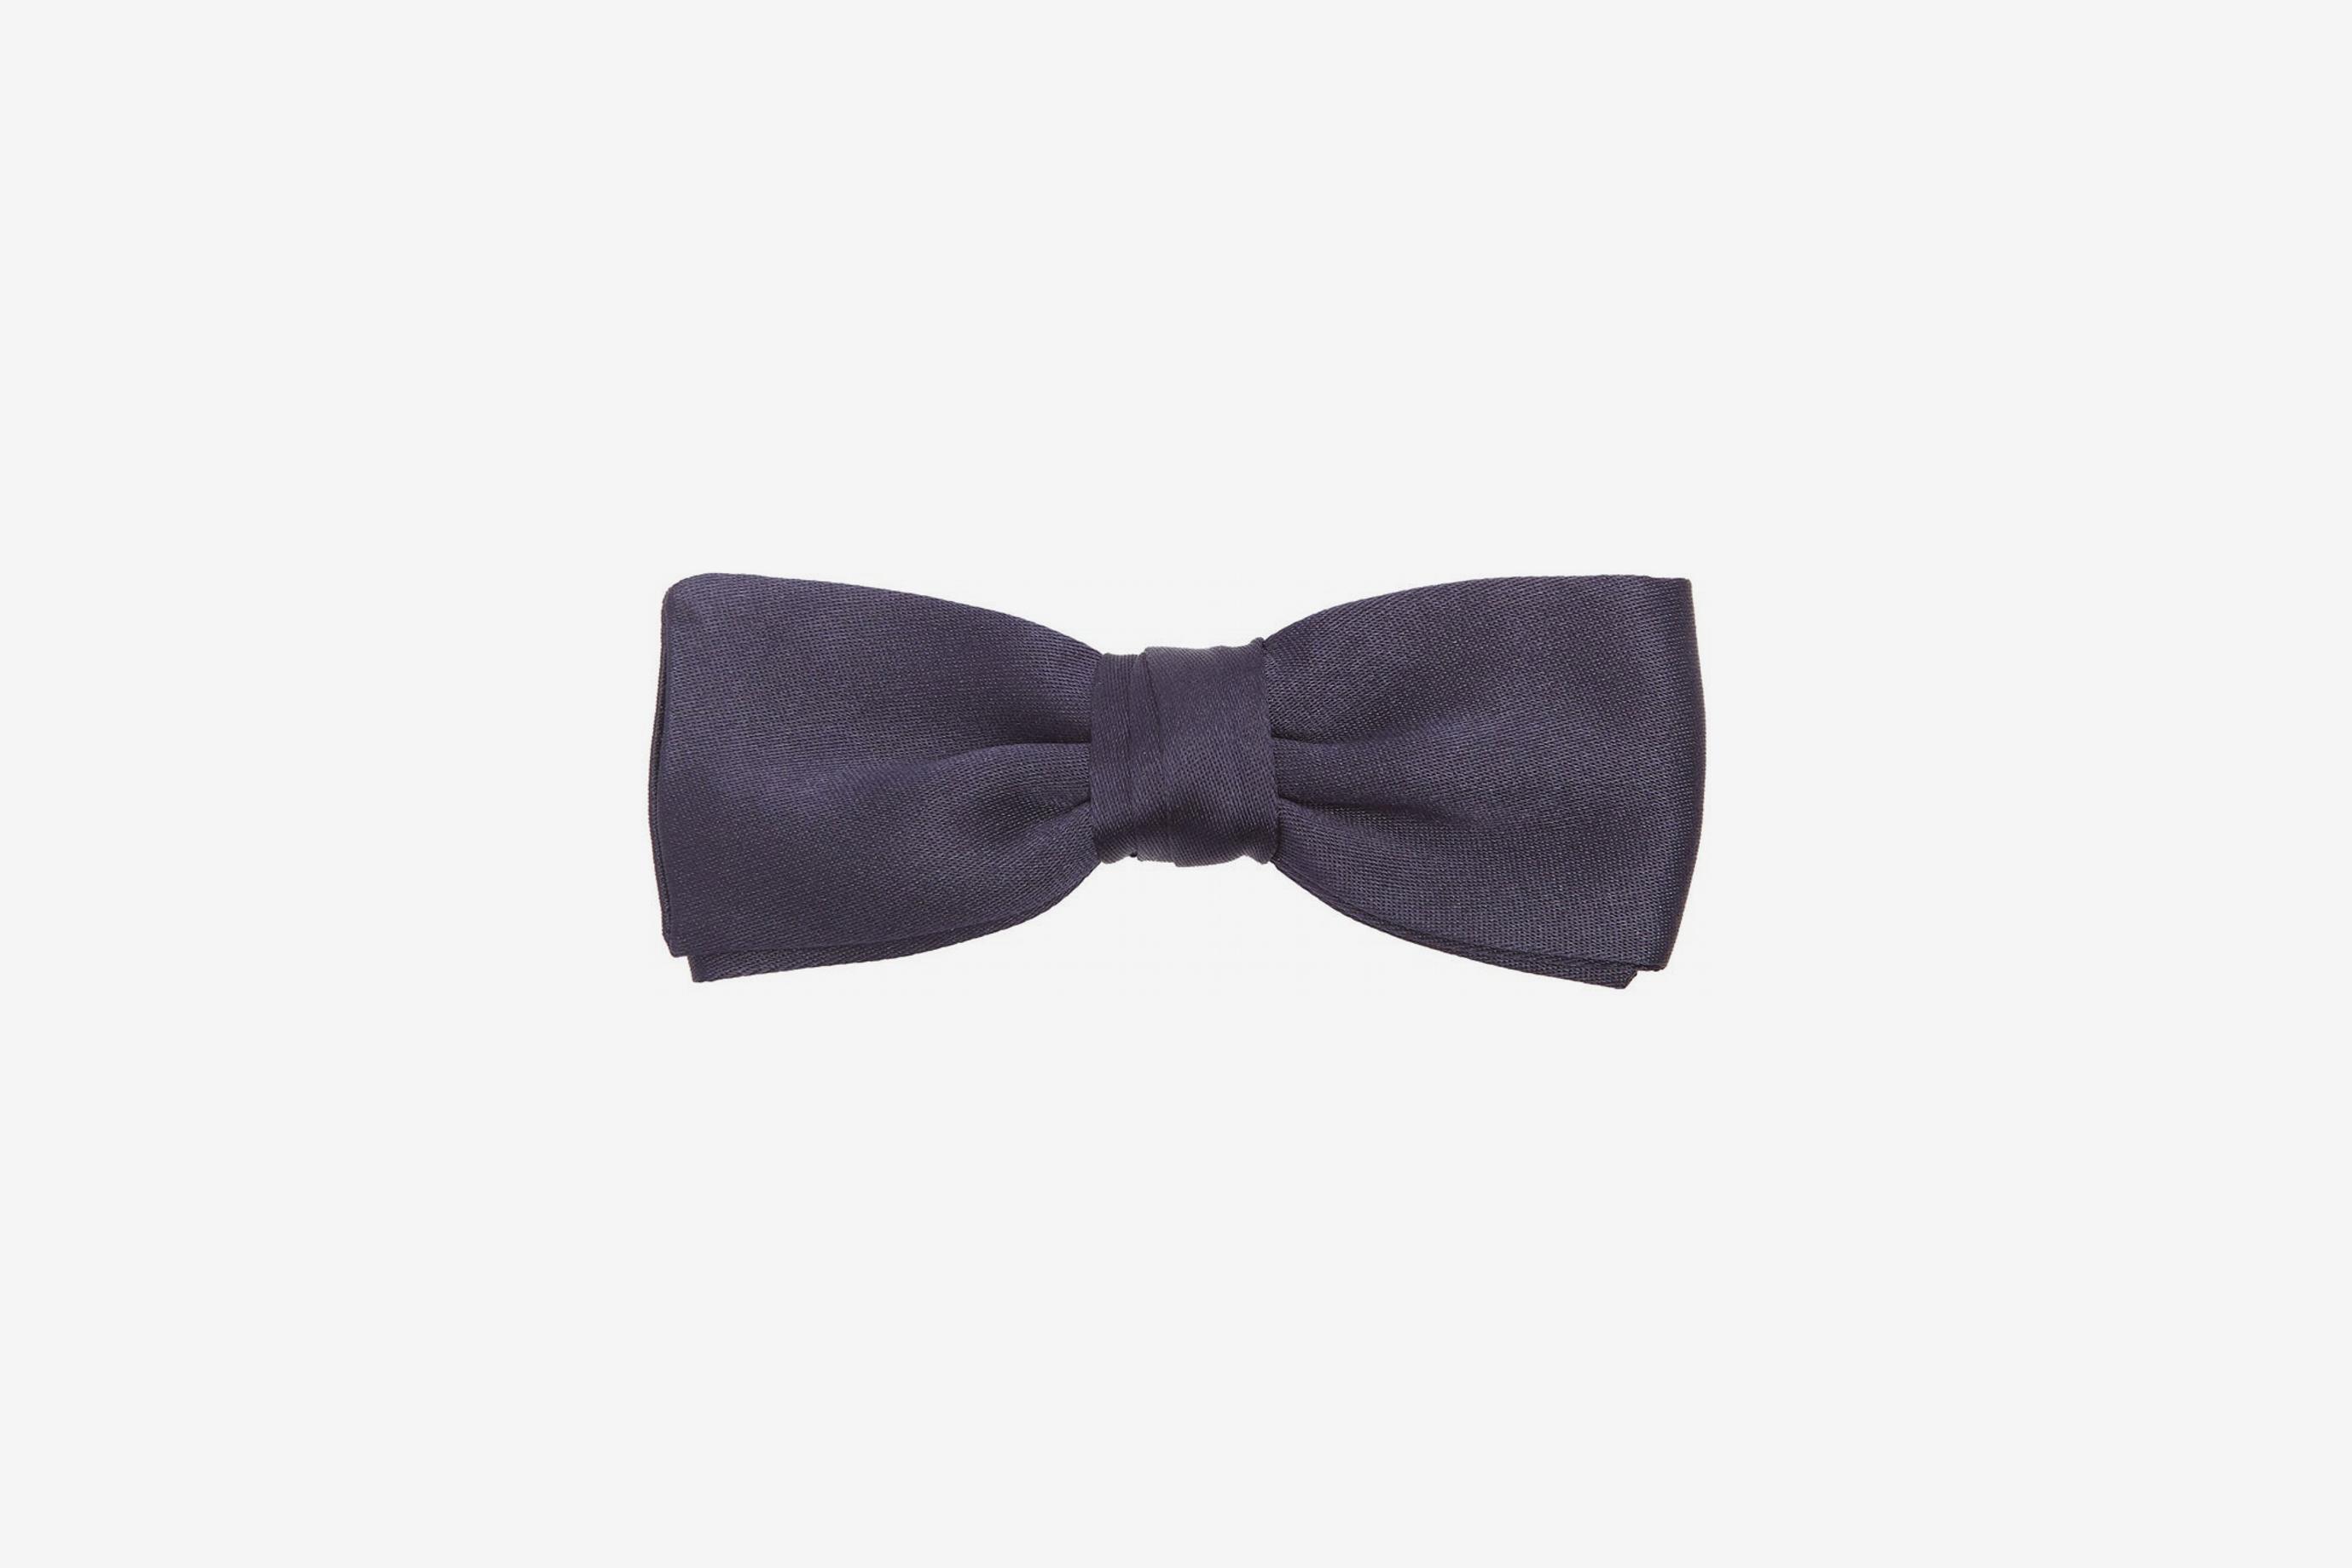 Prada Silk-Satin Bow Tie